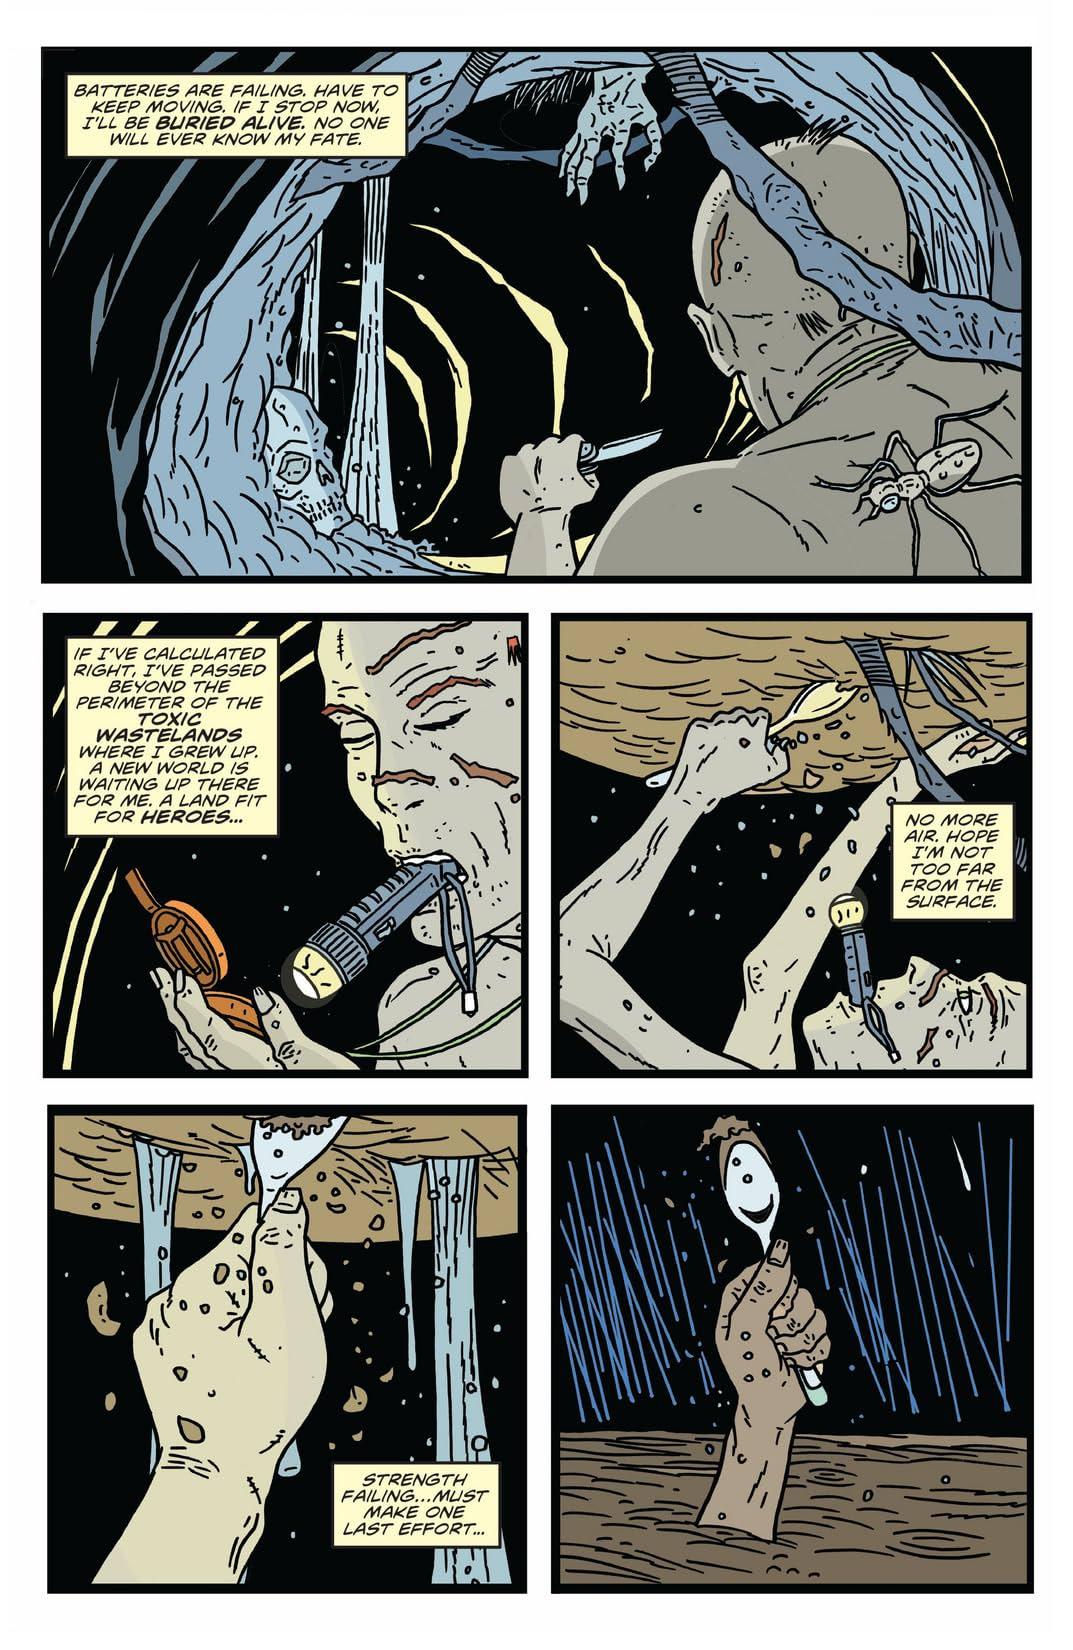 The Bulletproof Coffin: Disinterred #1 (of 6)